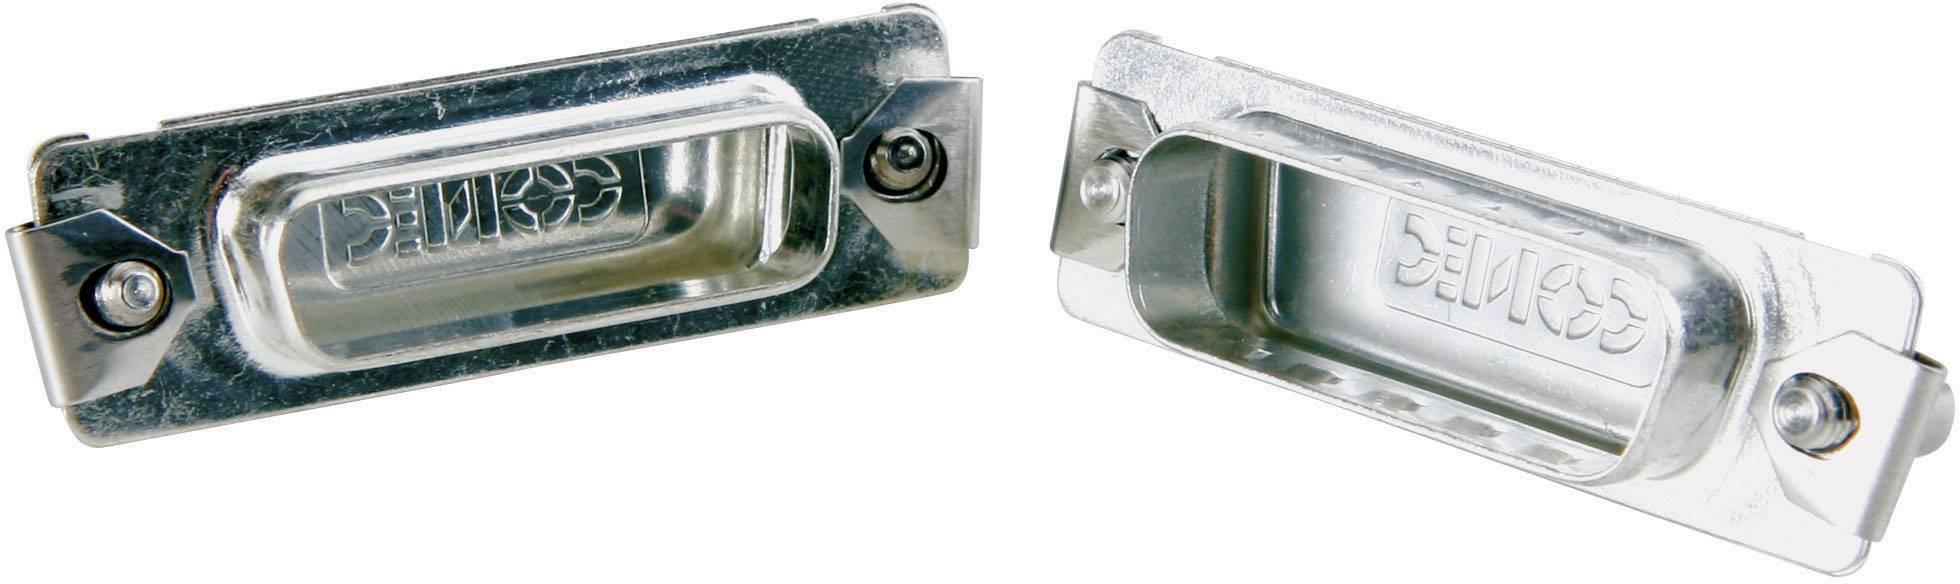 Záslepka D-SUB konektoru Conec 165X16799X, strieborná, 1 ks